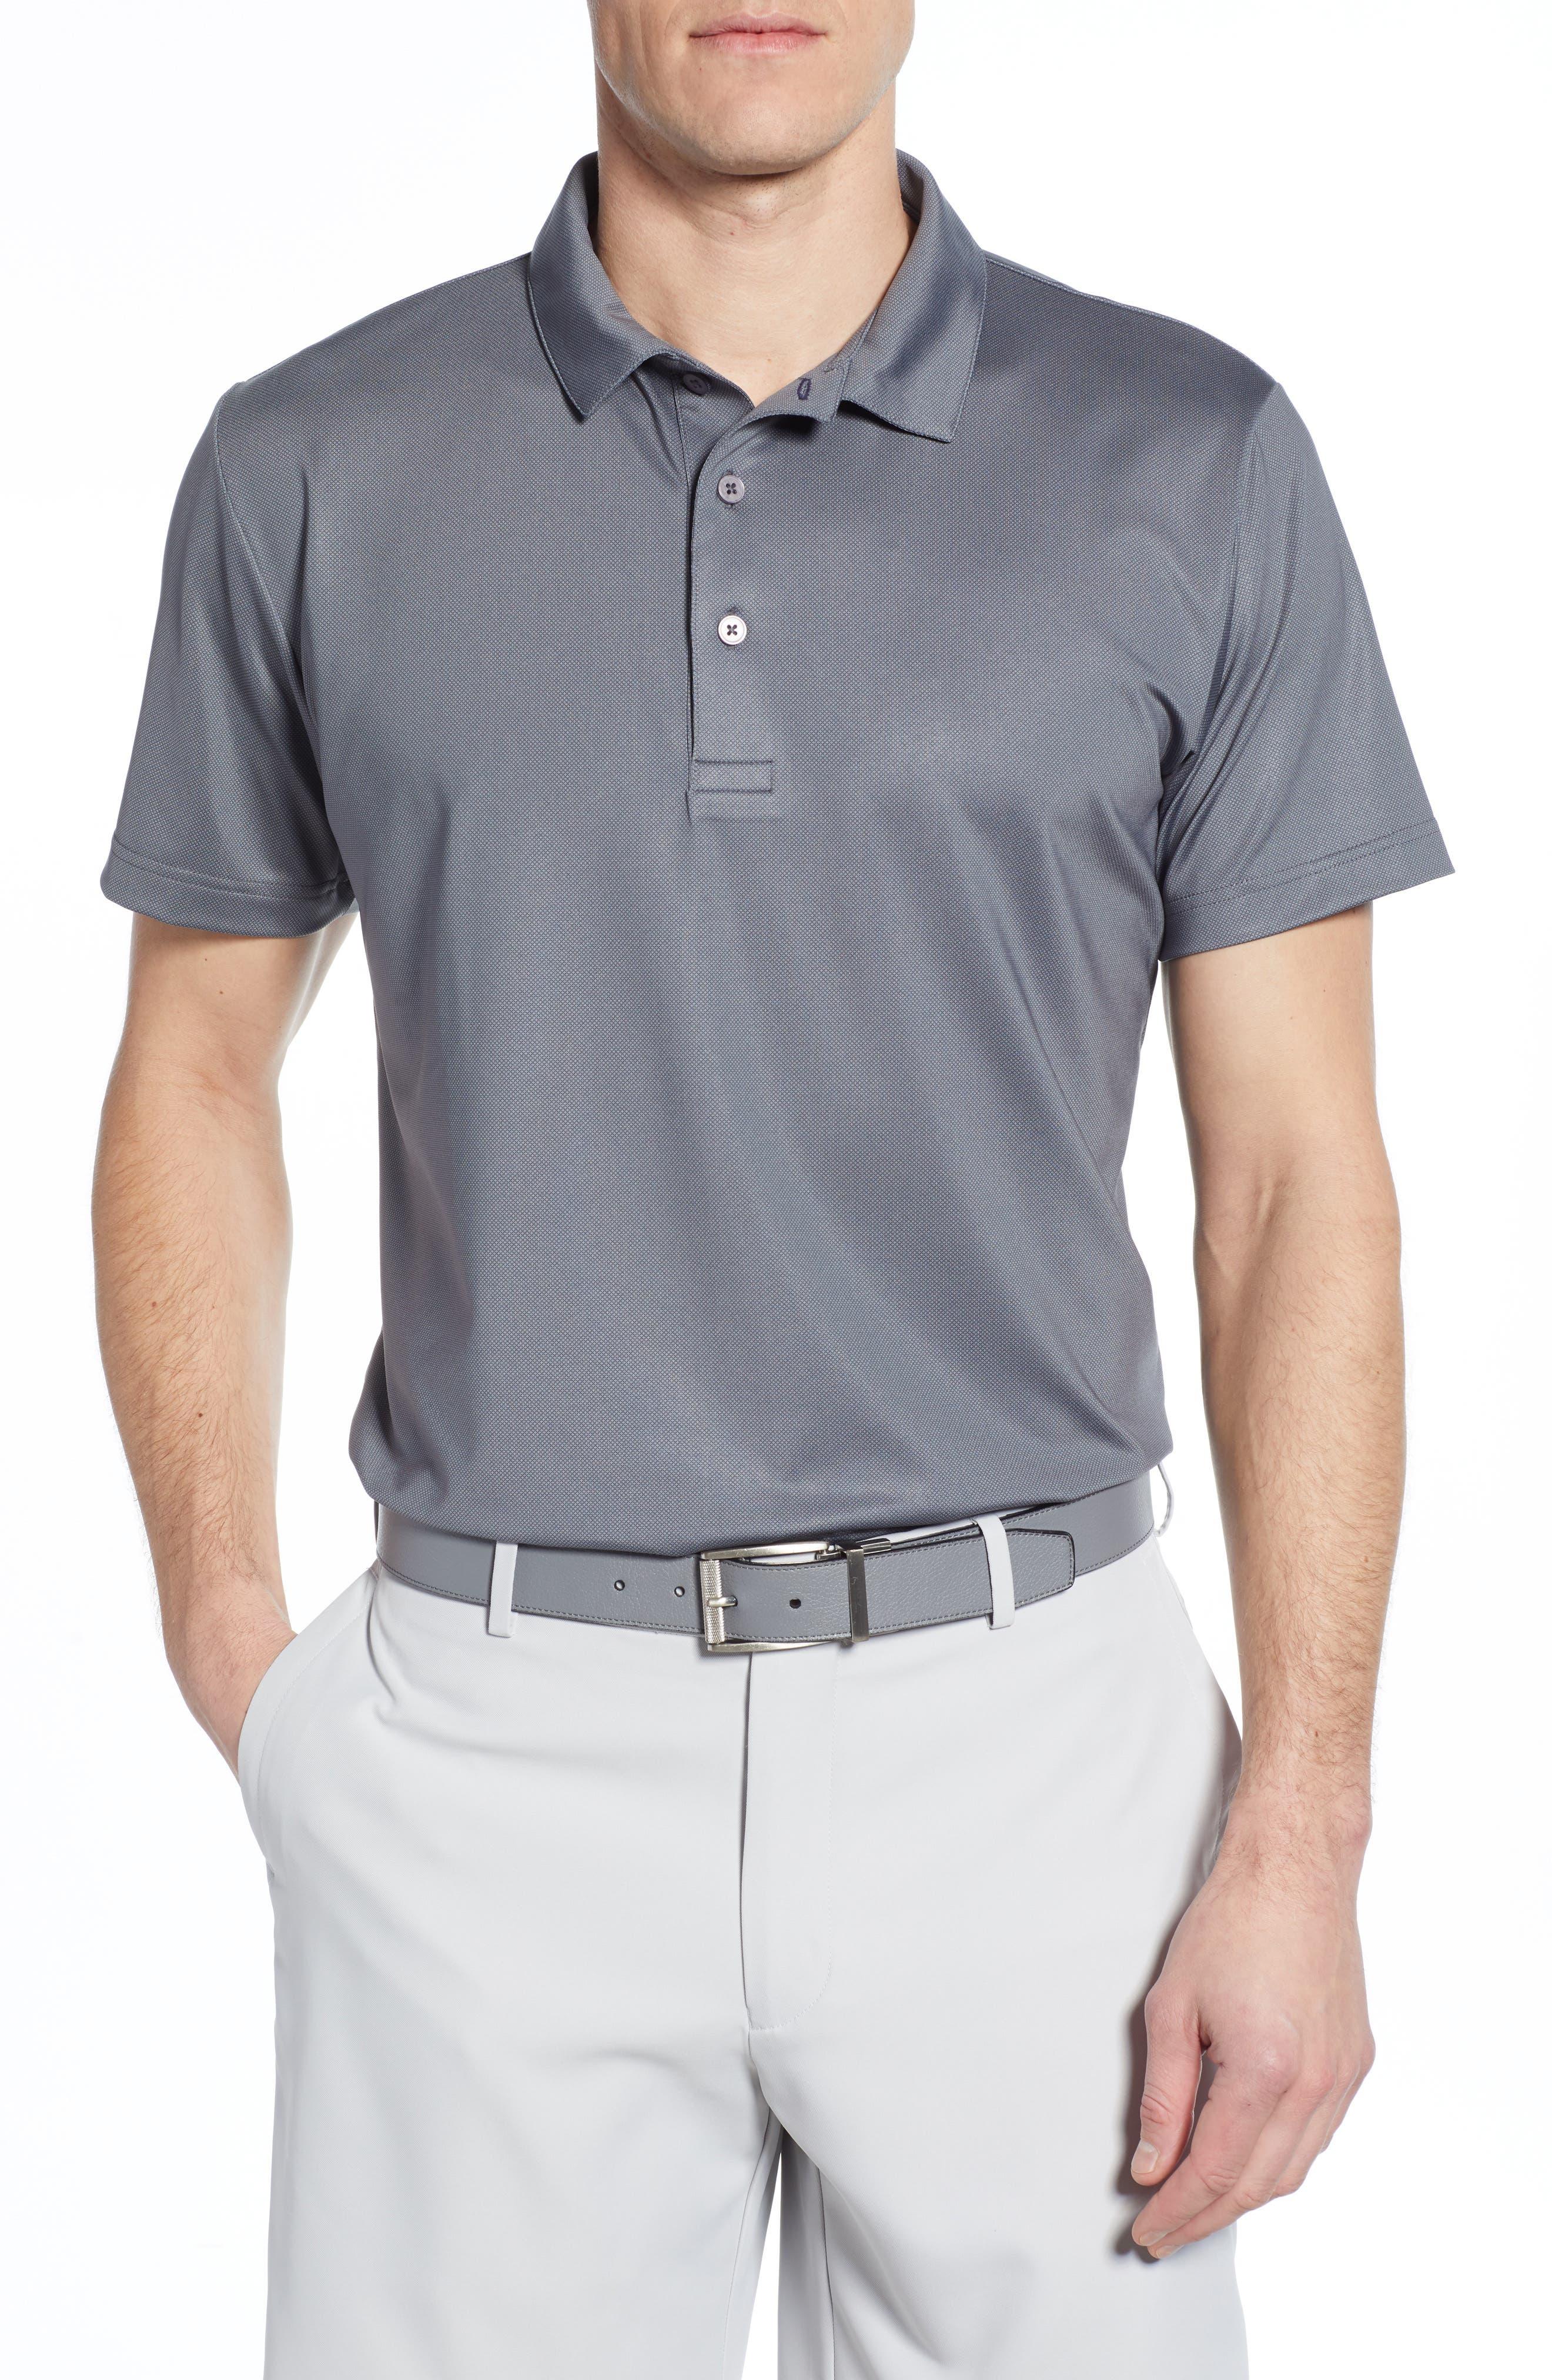 Mizzen+Main Phil Mickelson Regular Fit Performance Golf Polo, Grey